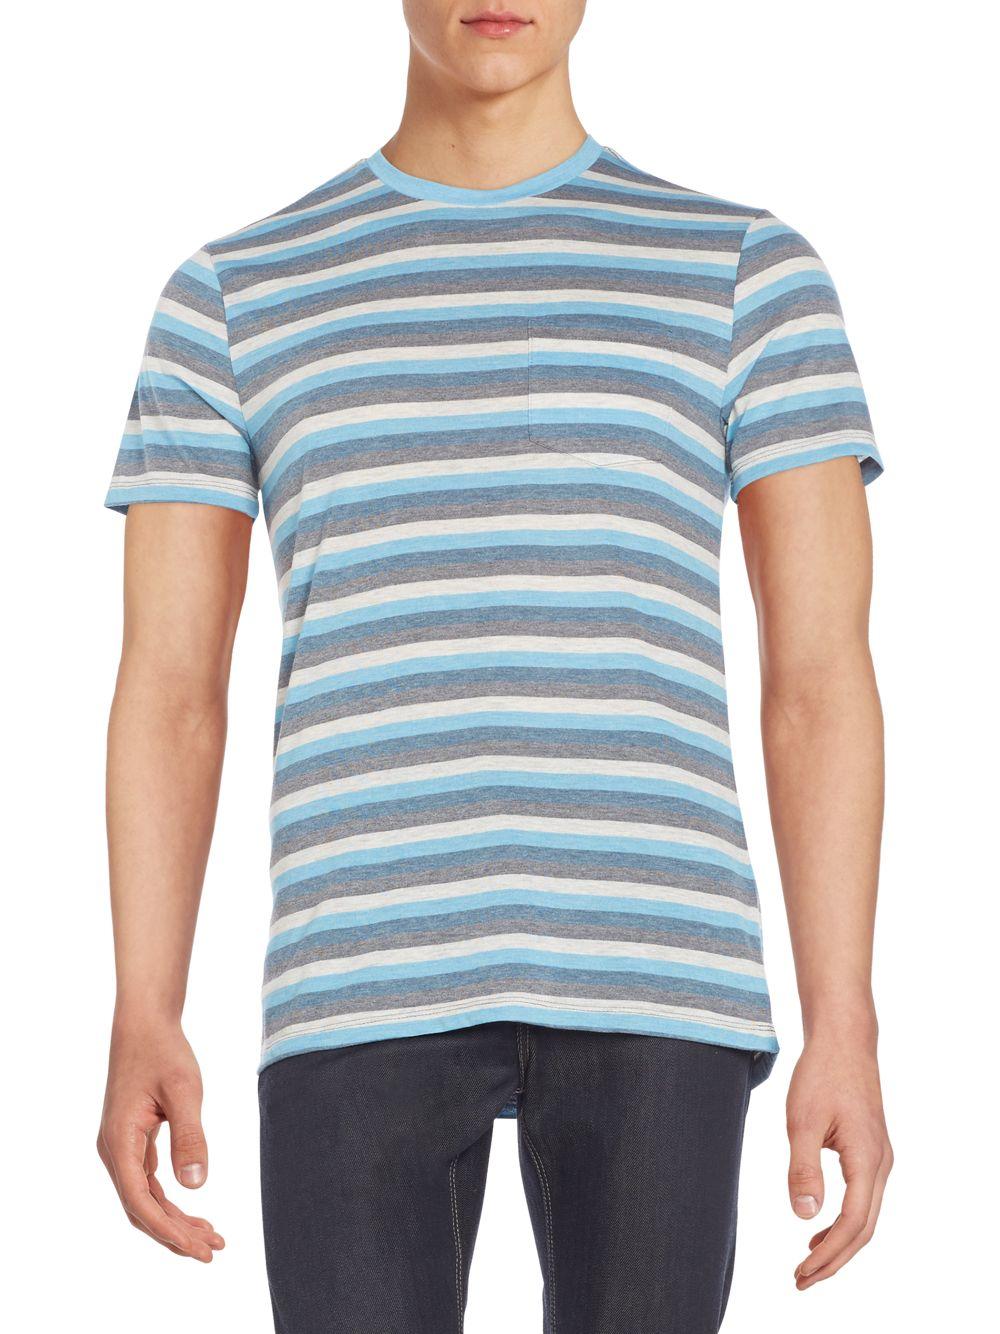 Slate And Stone Clothing : Slate stone sasha striped tee in blue for men lyst